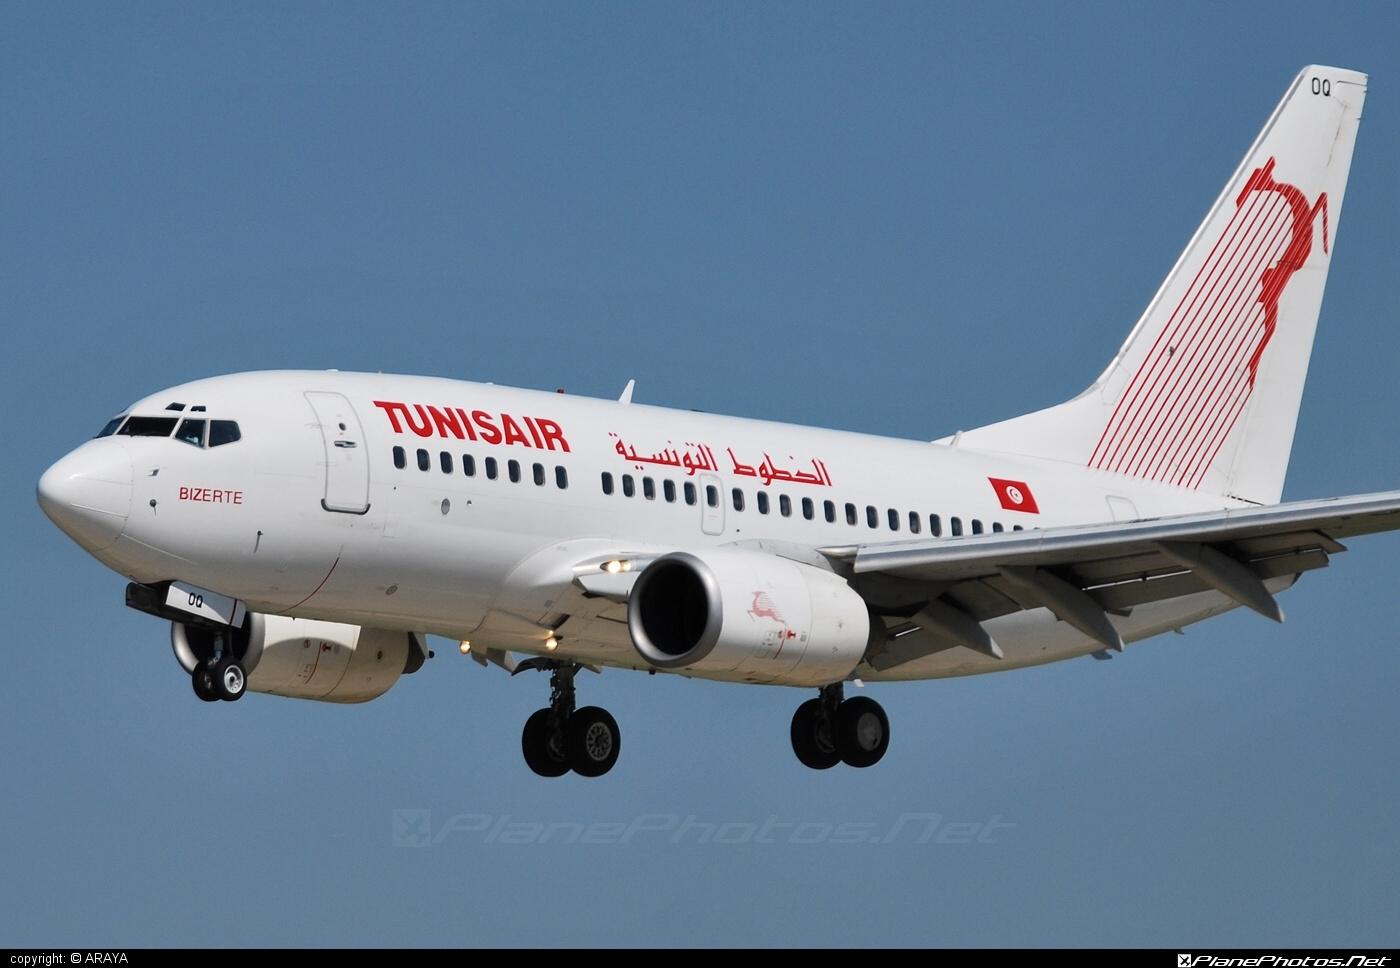 Boeing 737-600 - TS-IOQ operated by Tunisair #b737 #b737nextgen #b737ng #boeing #boeing737 #tunisair